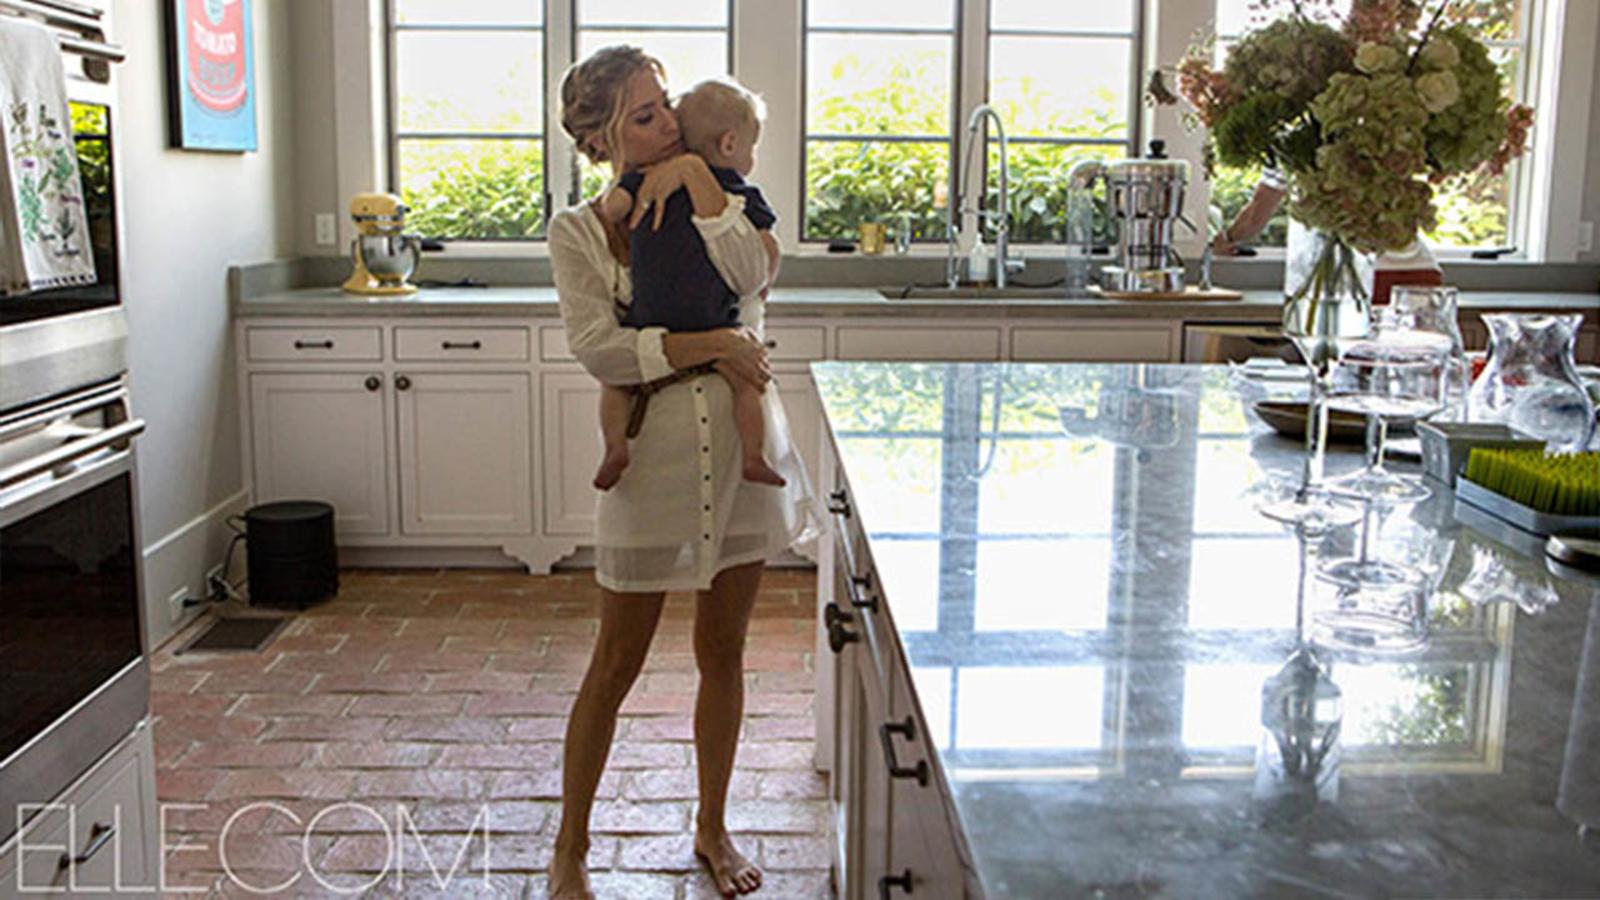 Photos Laguna Beach Star Kristin Cavallari And Chicago Bears Quarterback Jay Cutler Through The Years Abc7 Los Angeles